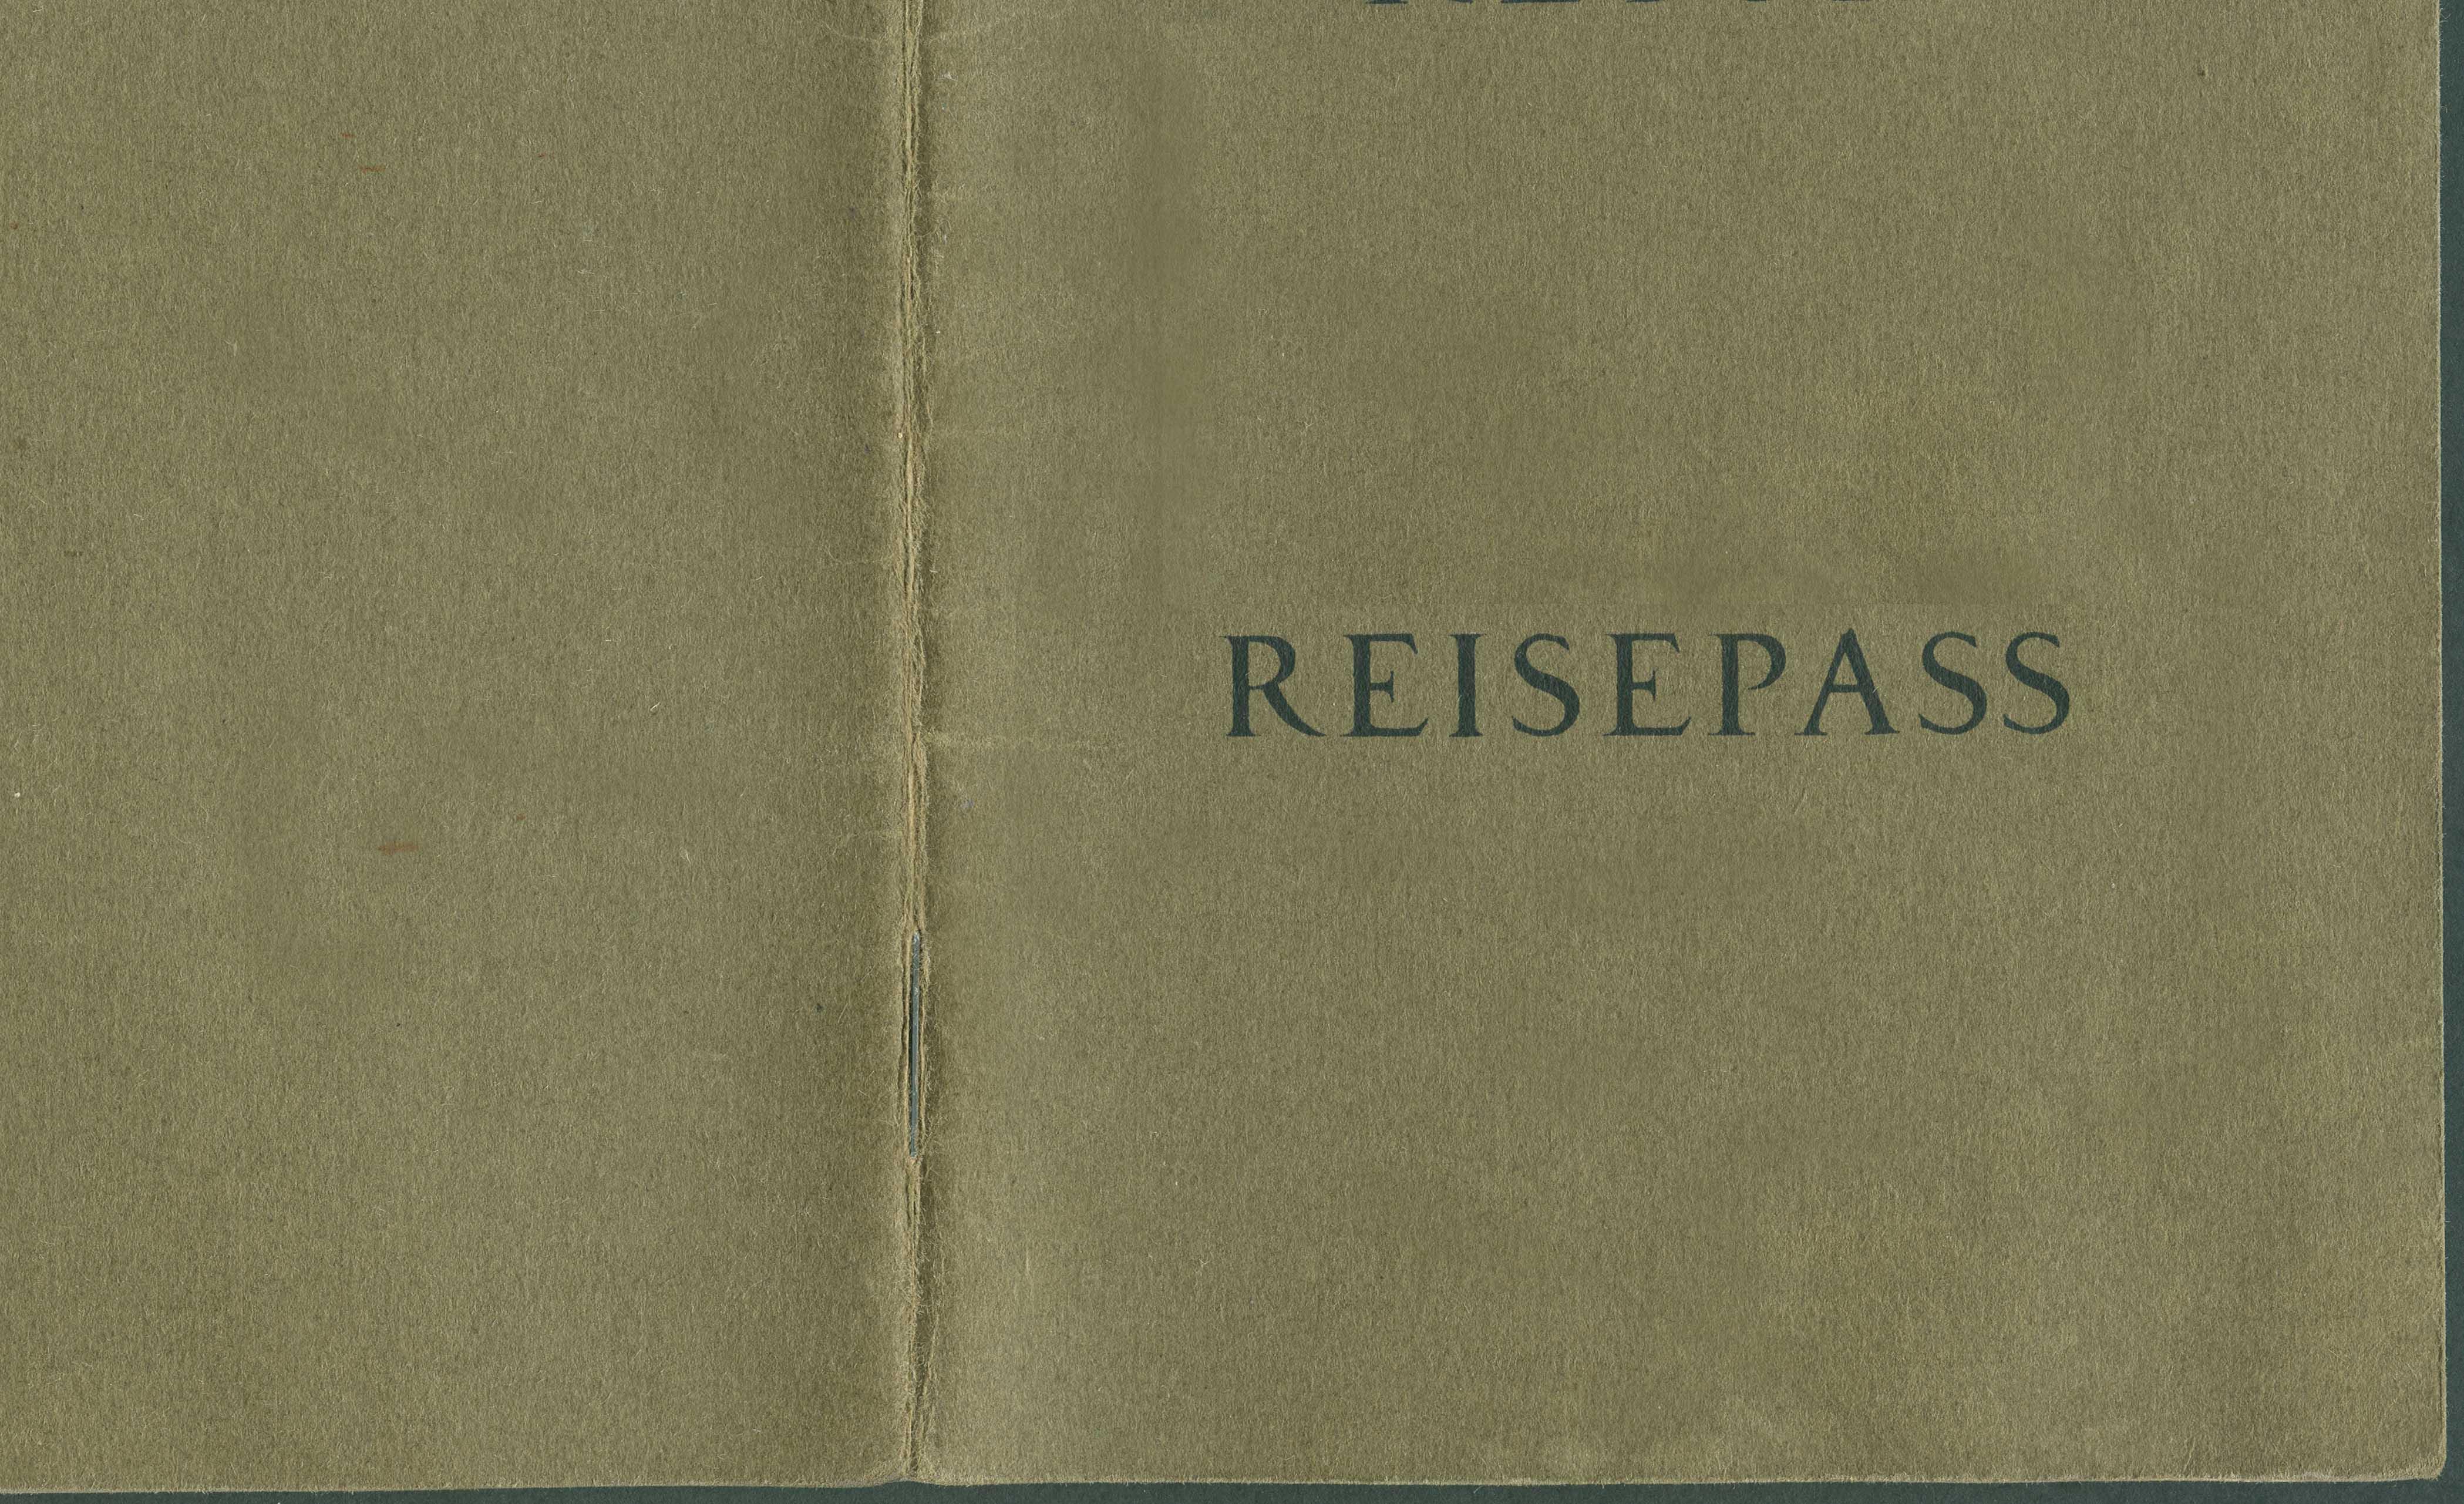 Third Reich Émigrés and Traumatic Political Change